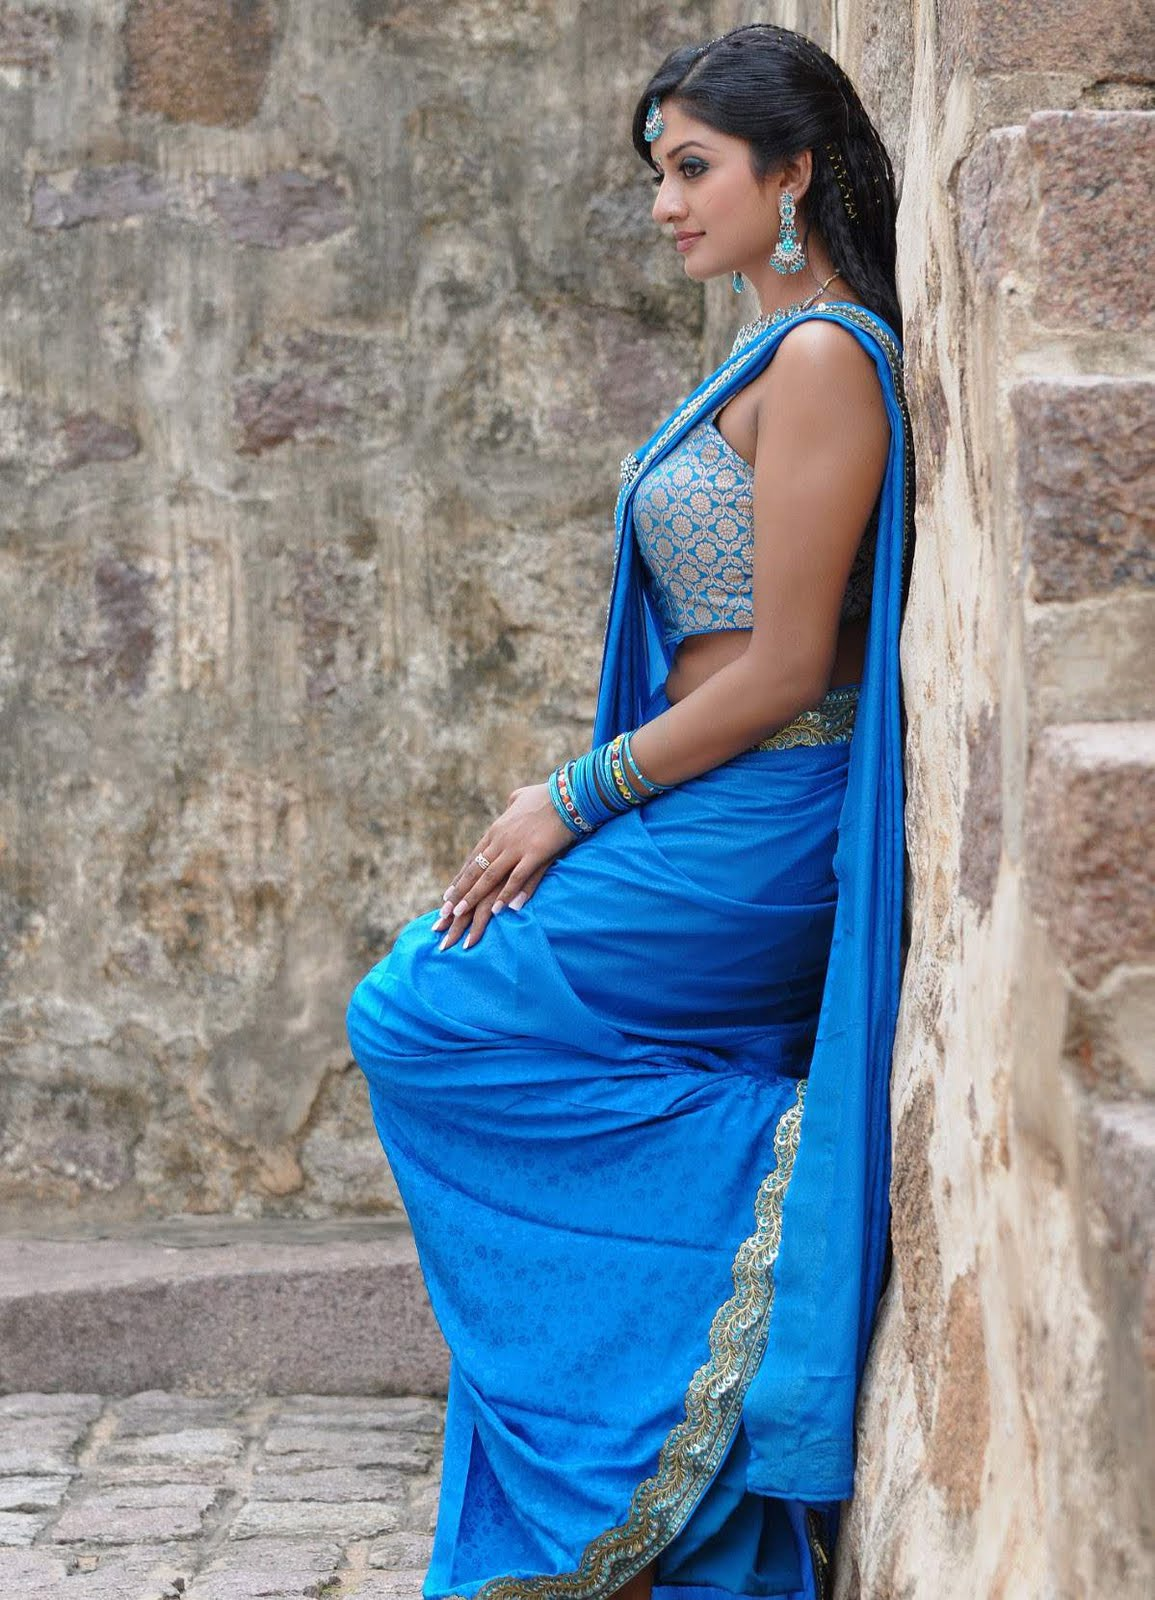 Vimala Raman hot and cute pics